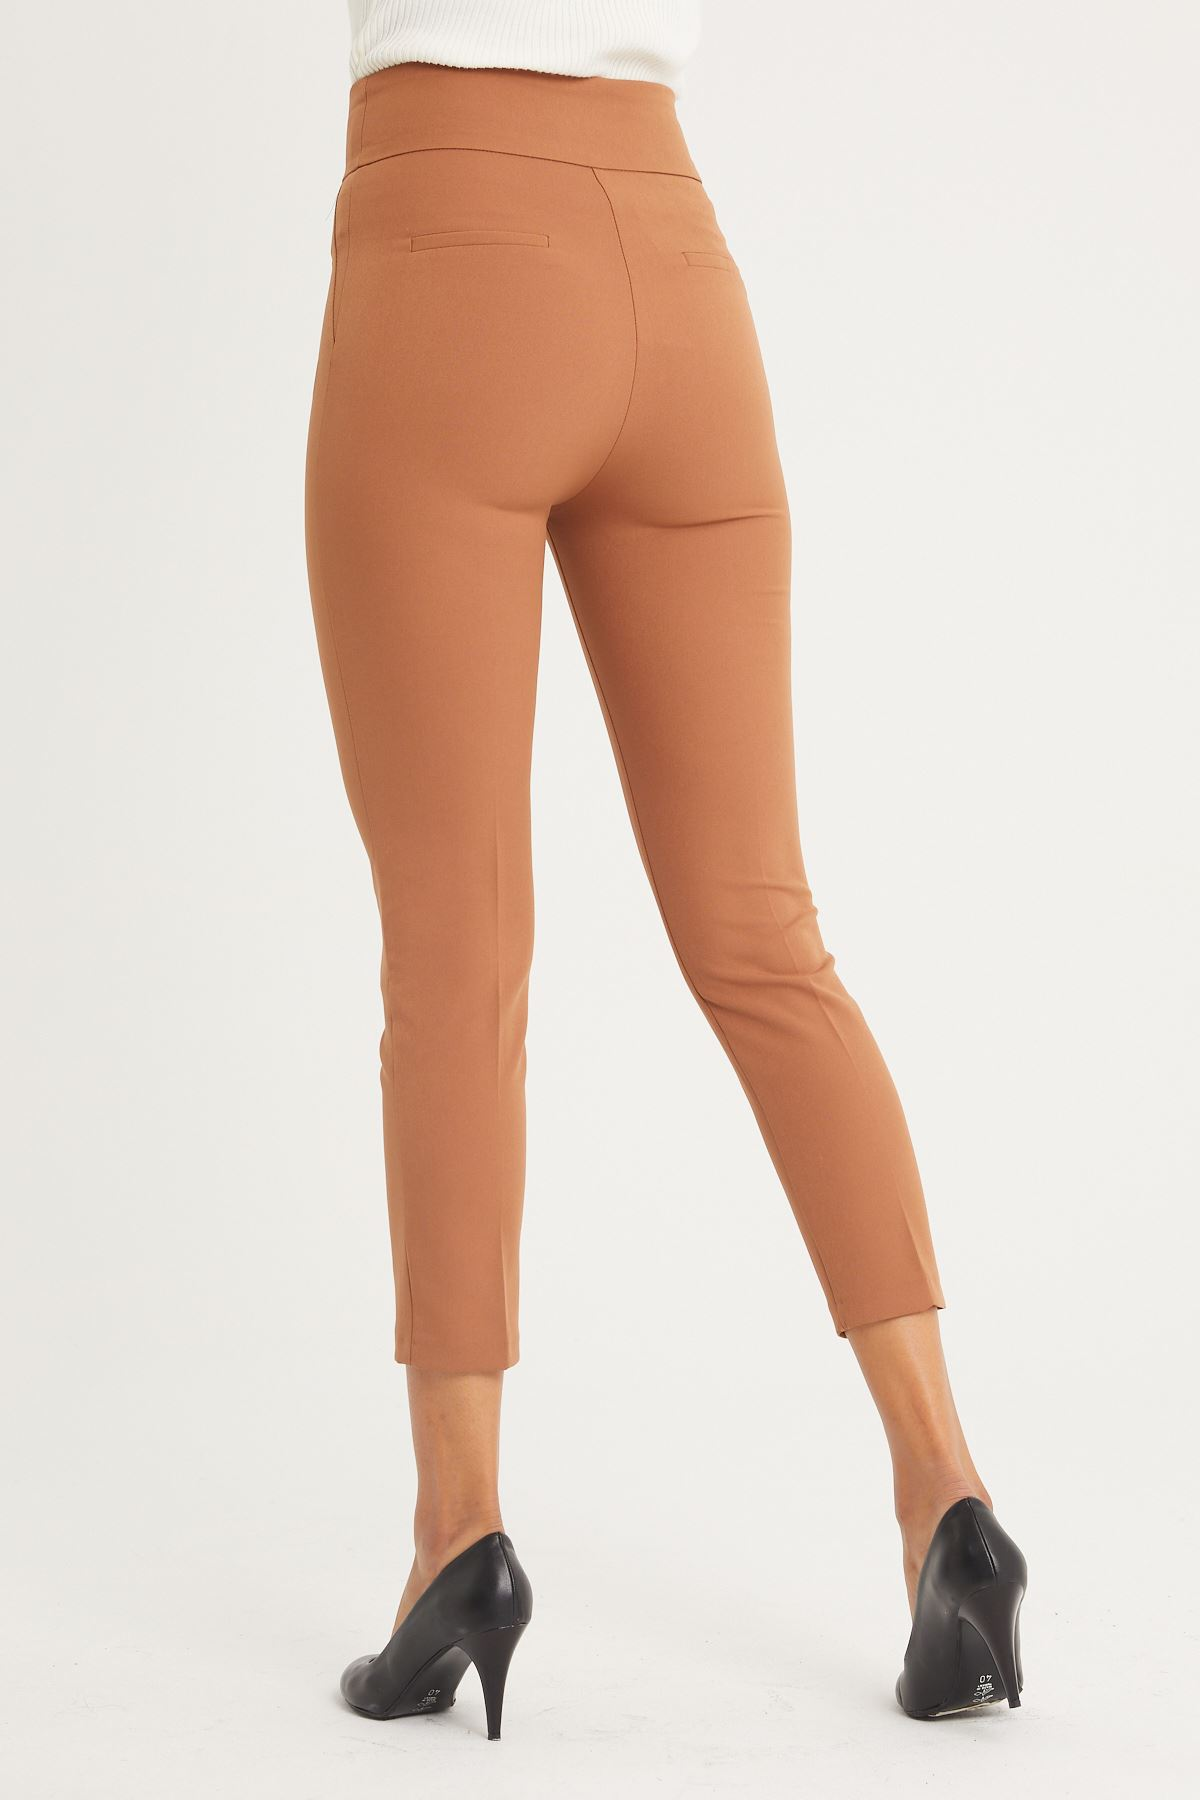 Yüksek Bel Kumaş Pantolon